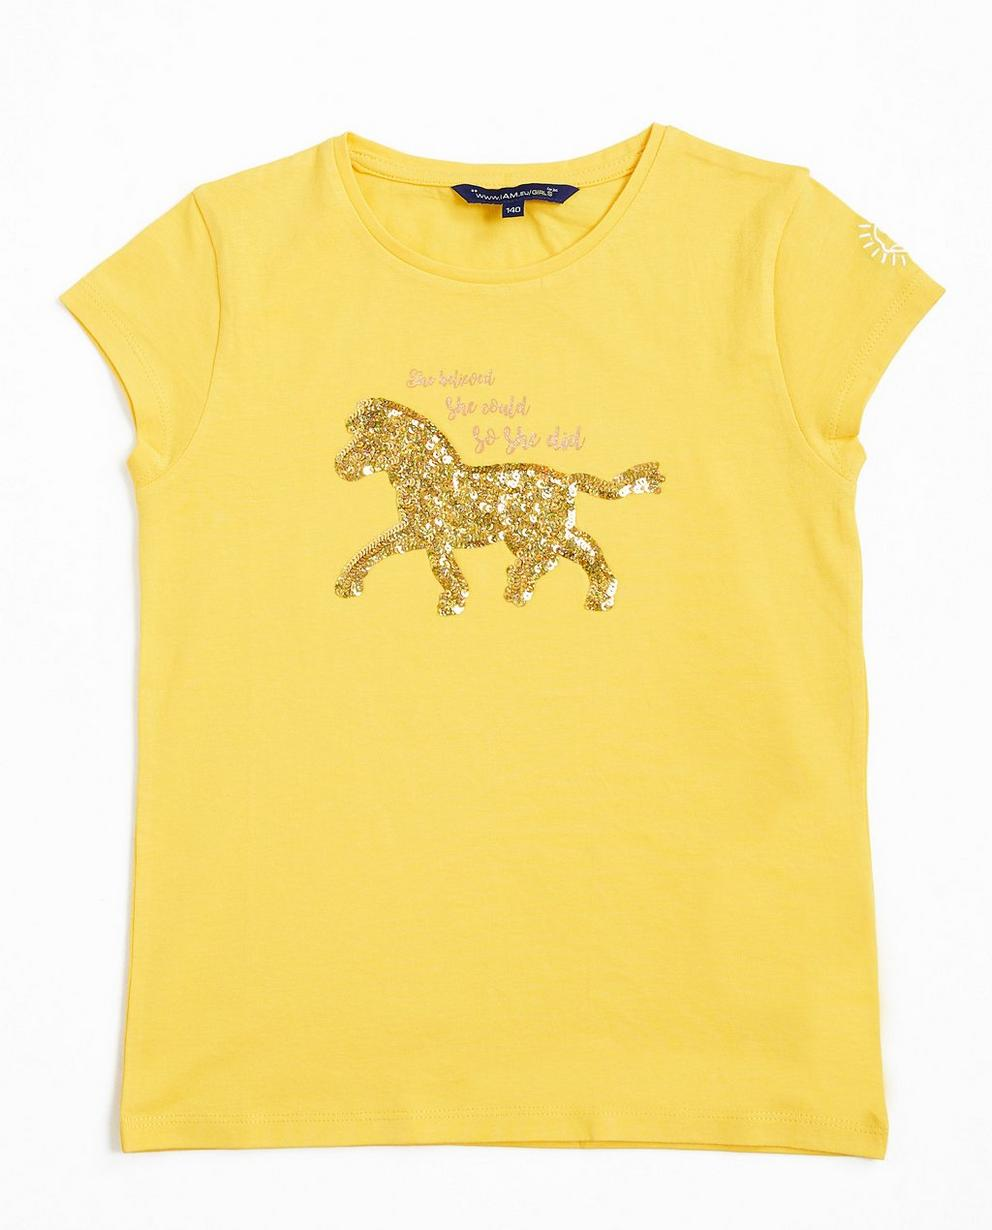 Gelbes T-Shirt mit Print - I AM - I AM